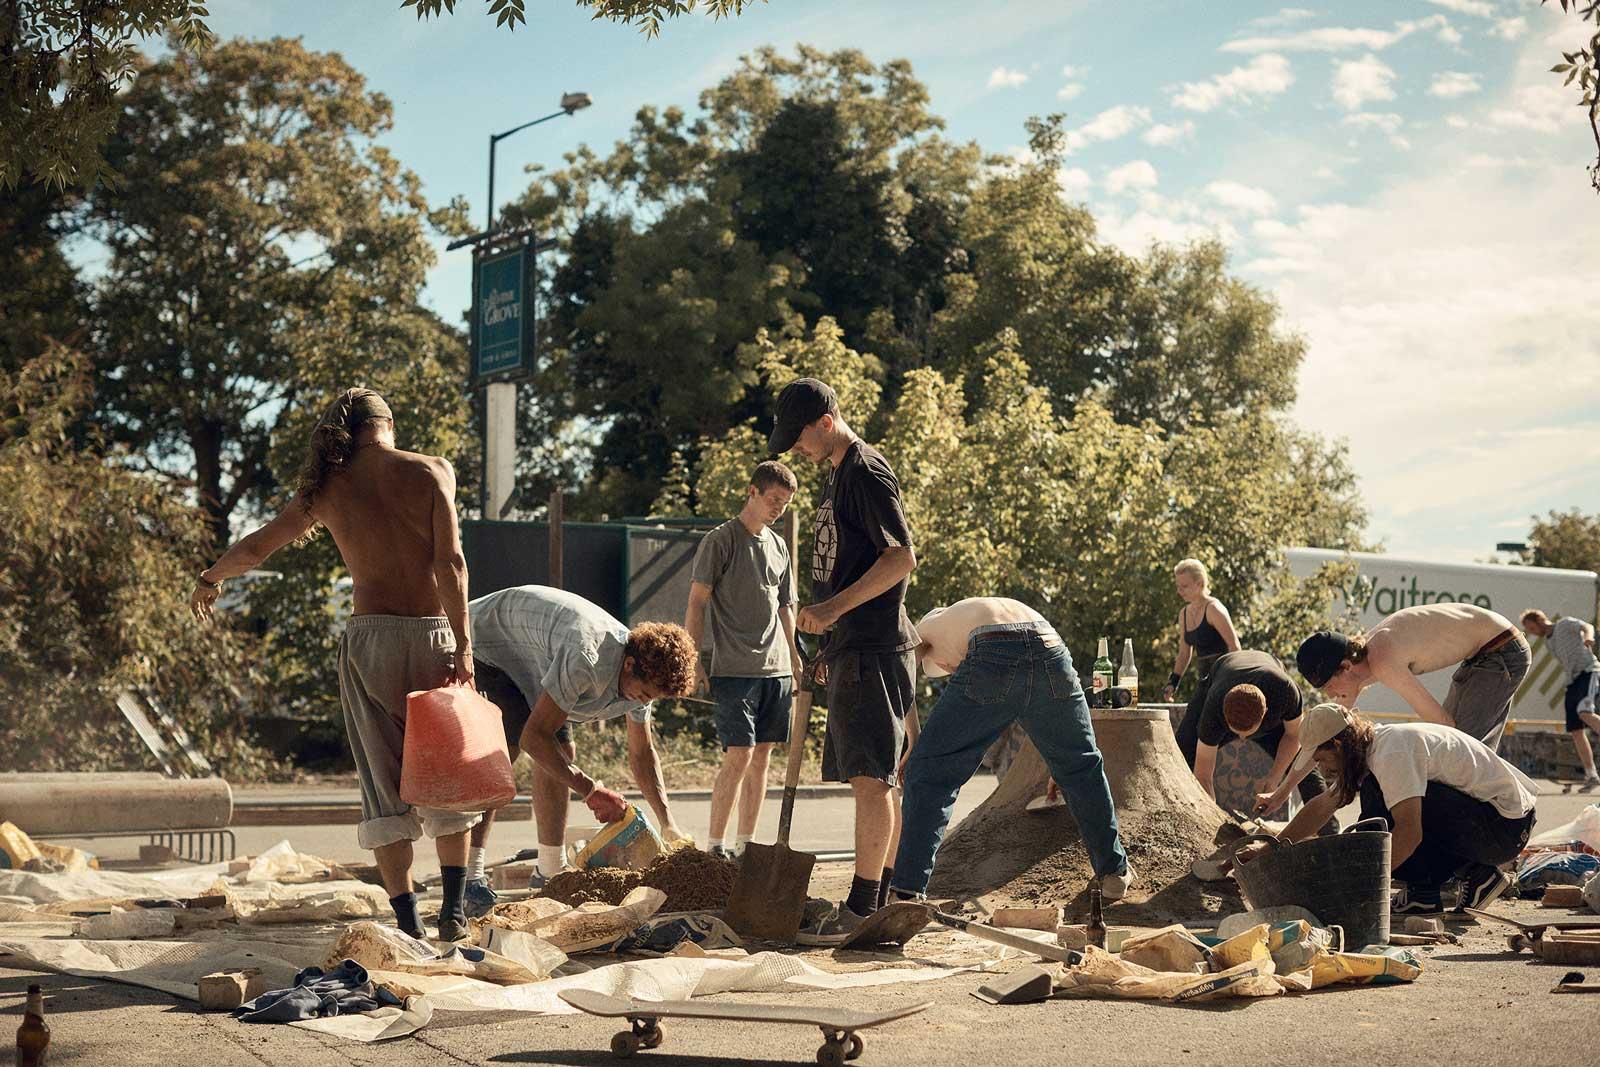 skaters constructing a skate park